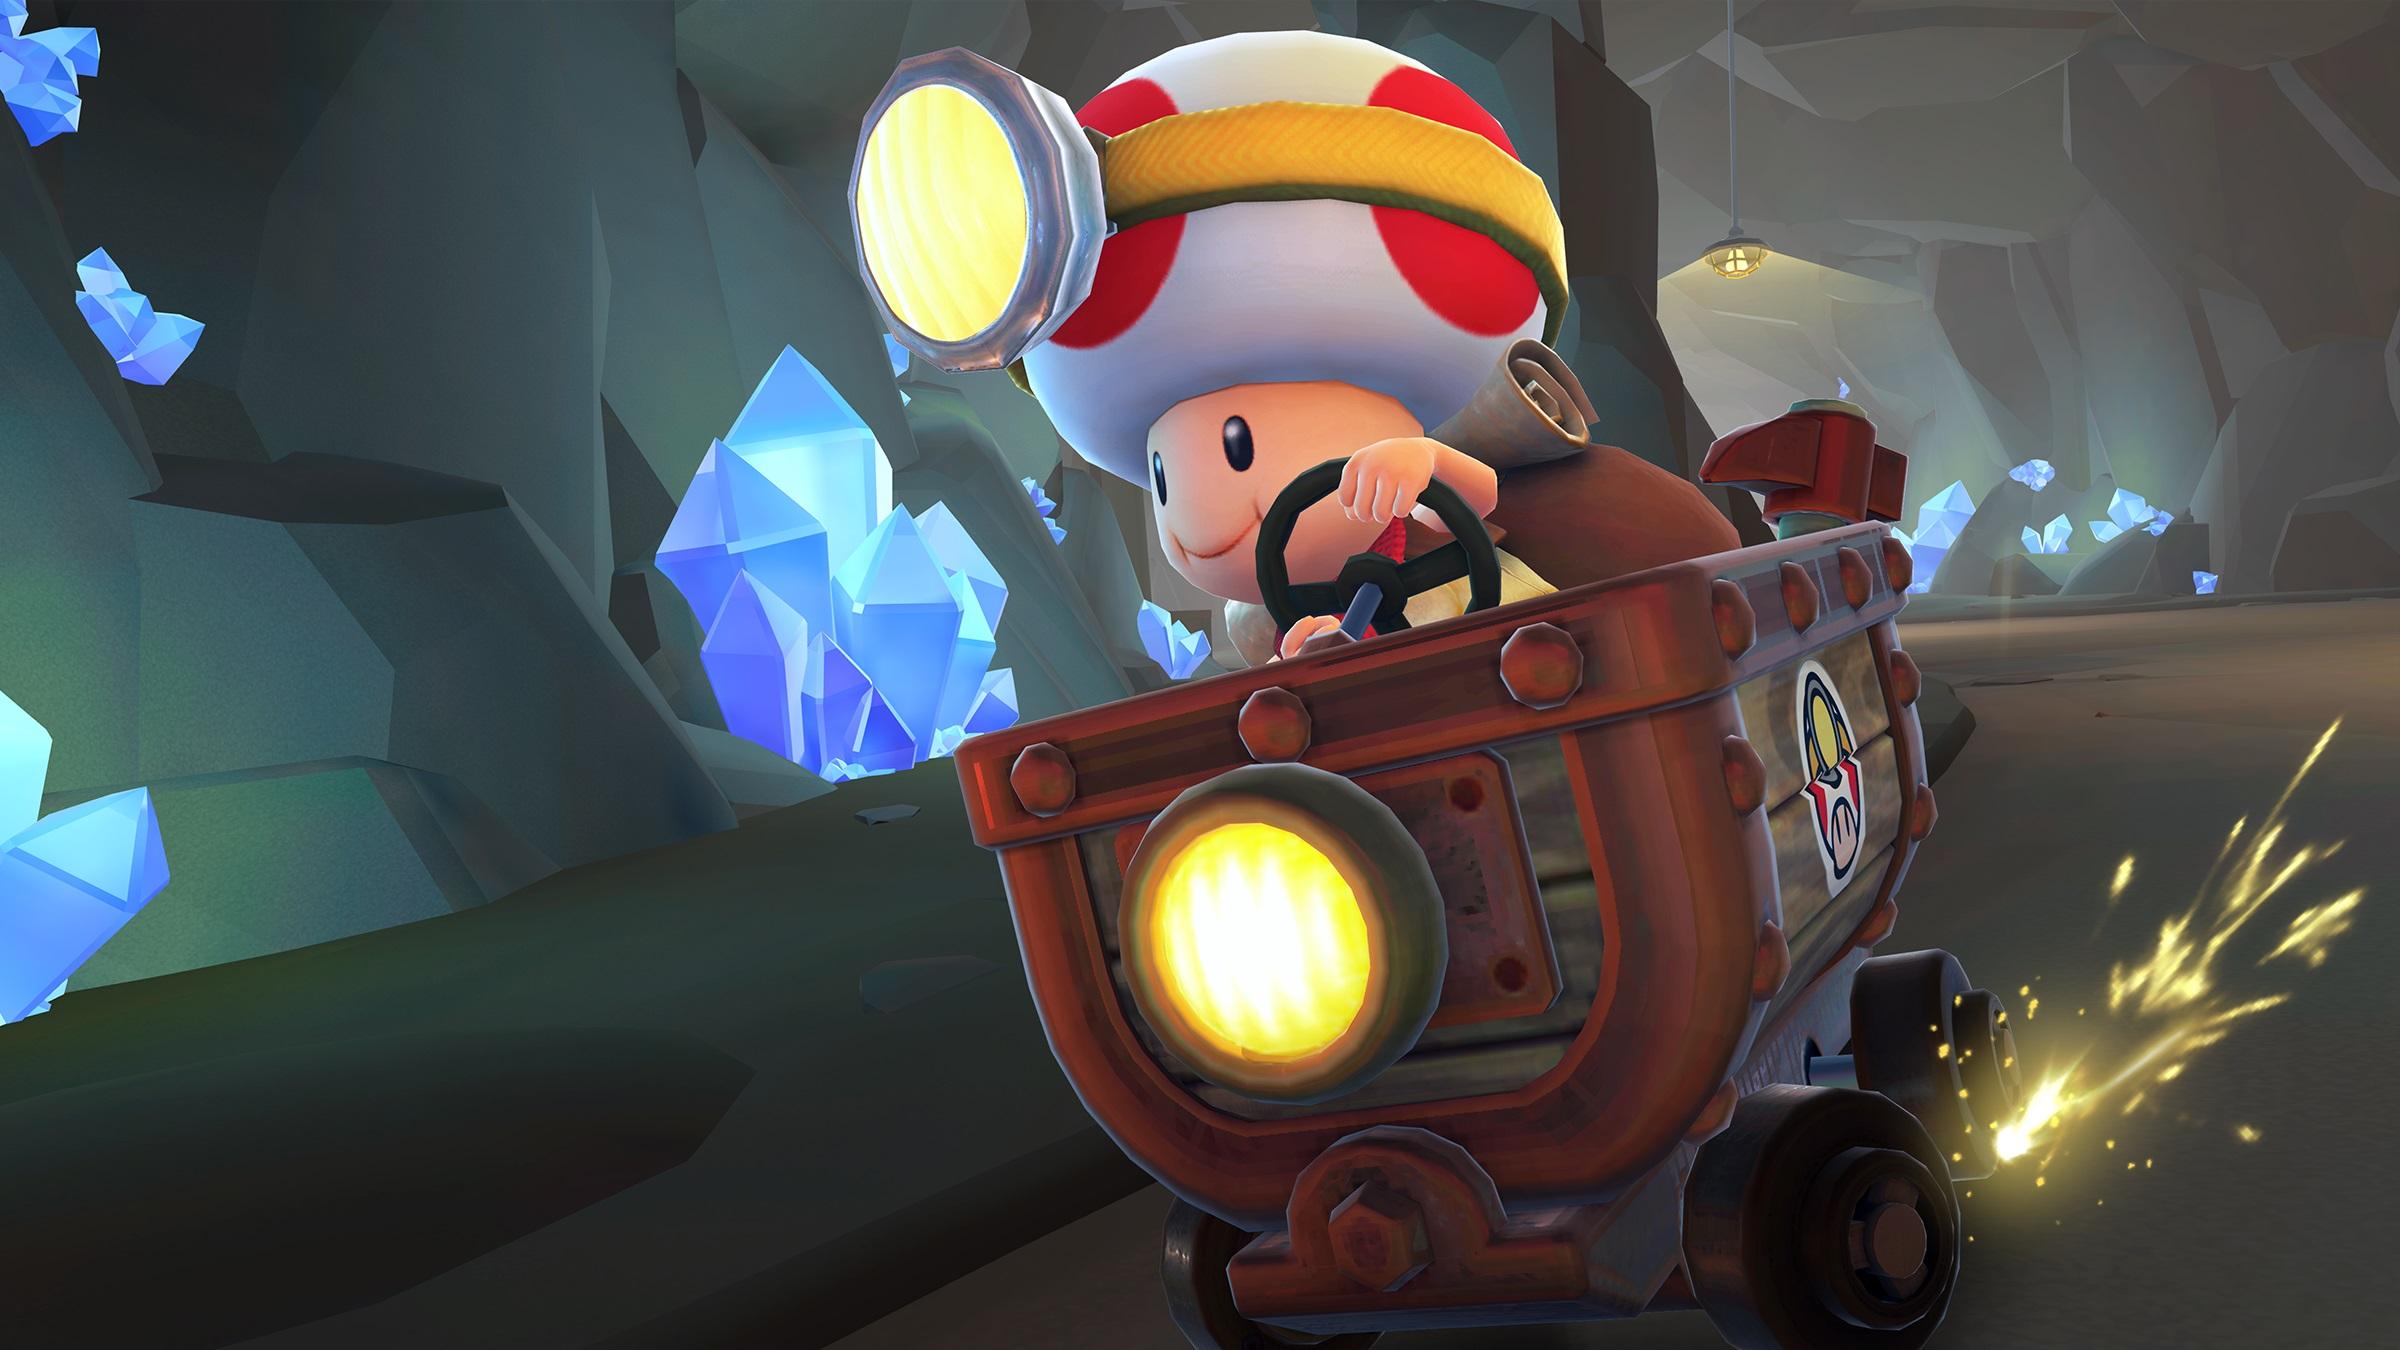 Mario Kart Tour gets an injection of Captain Toad: Treasure Tracker screenshot